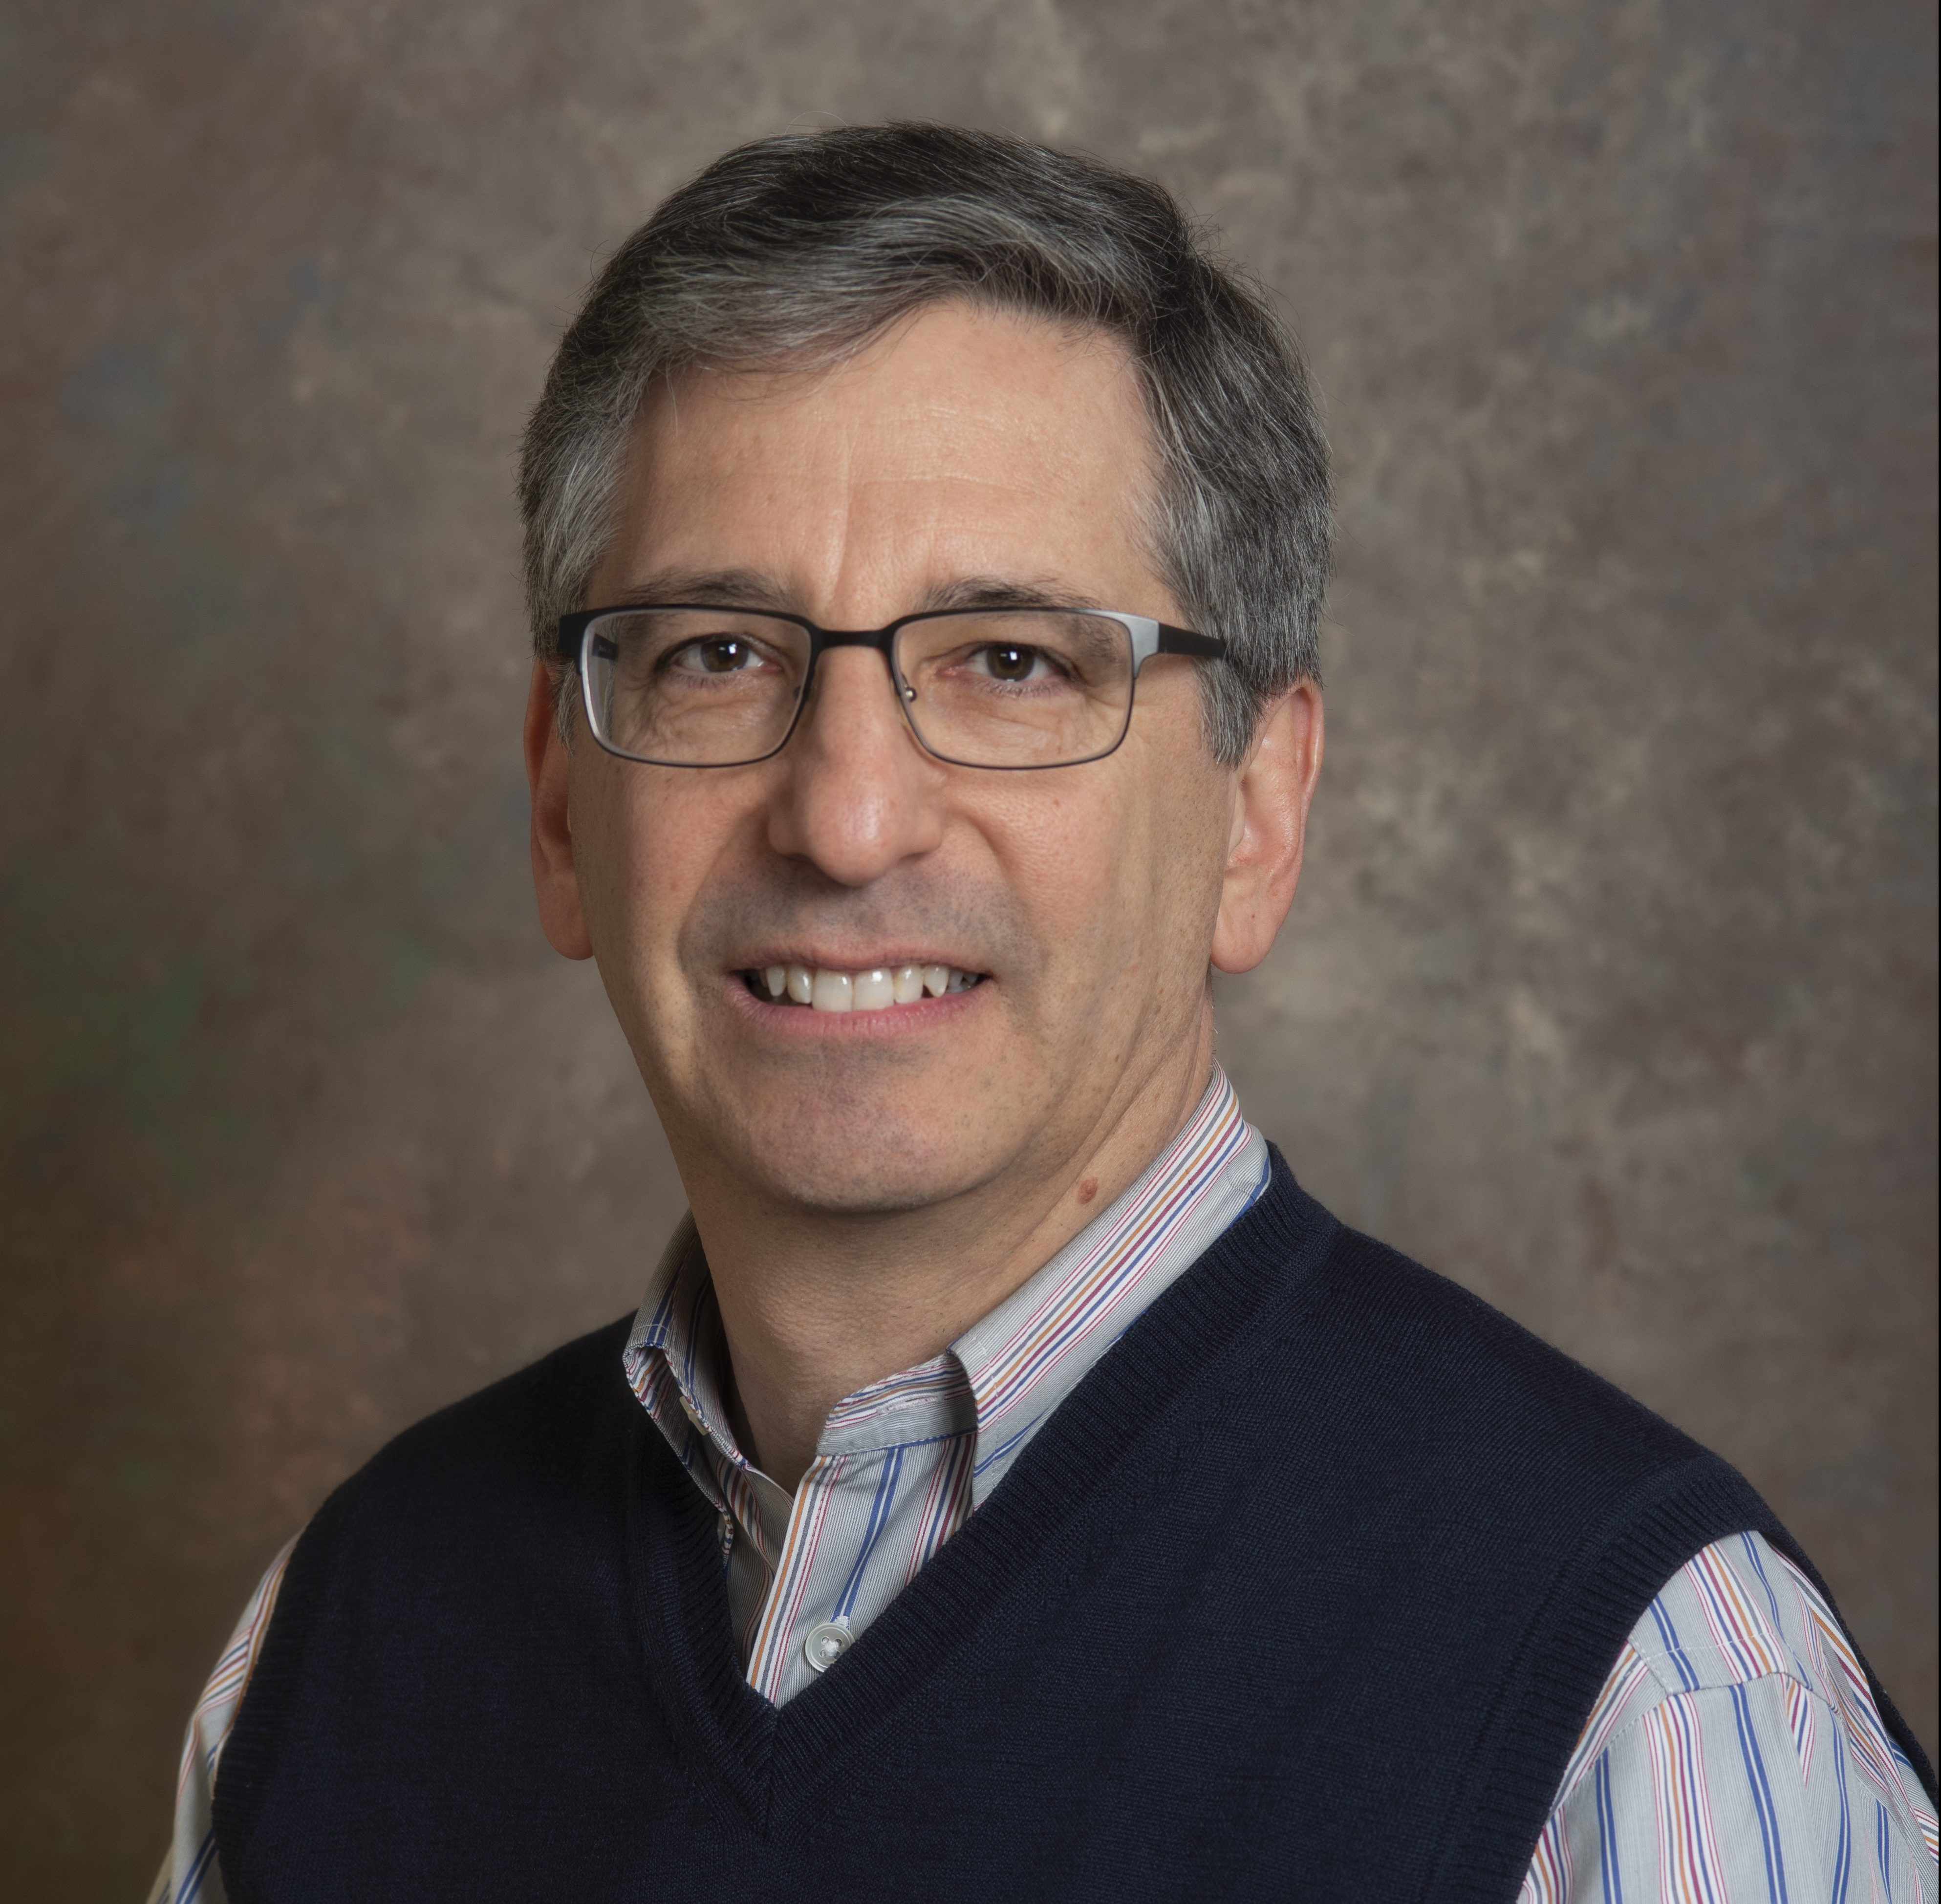 Michael Blaustein